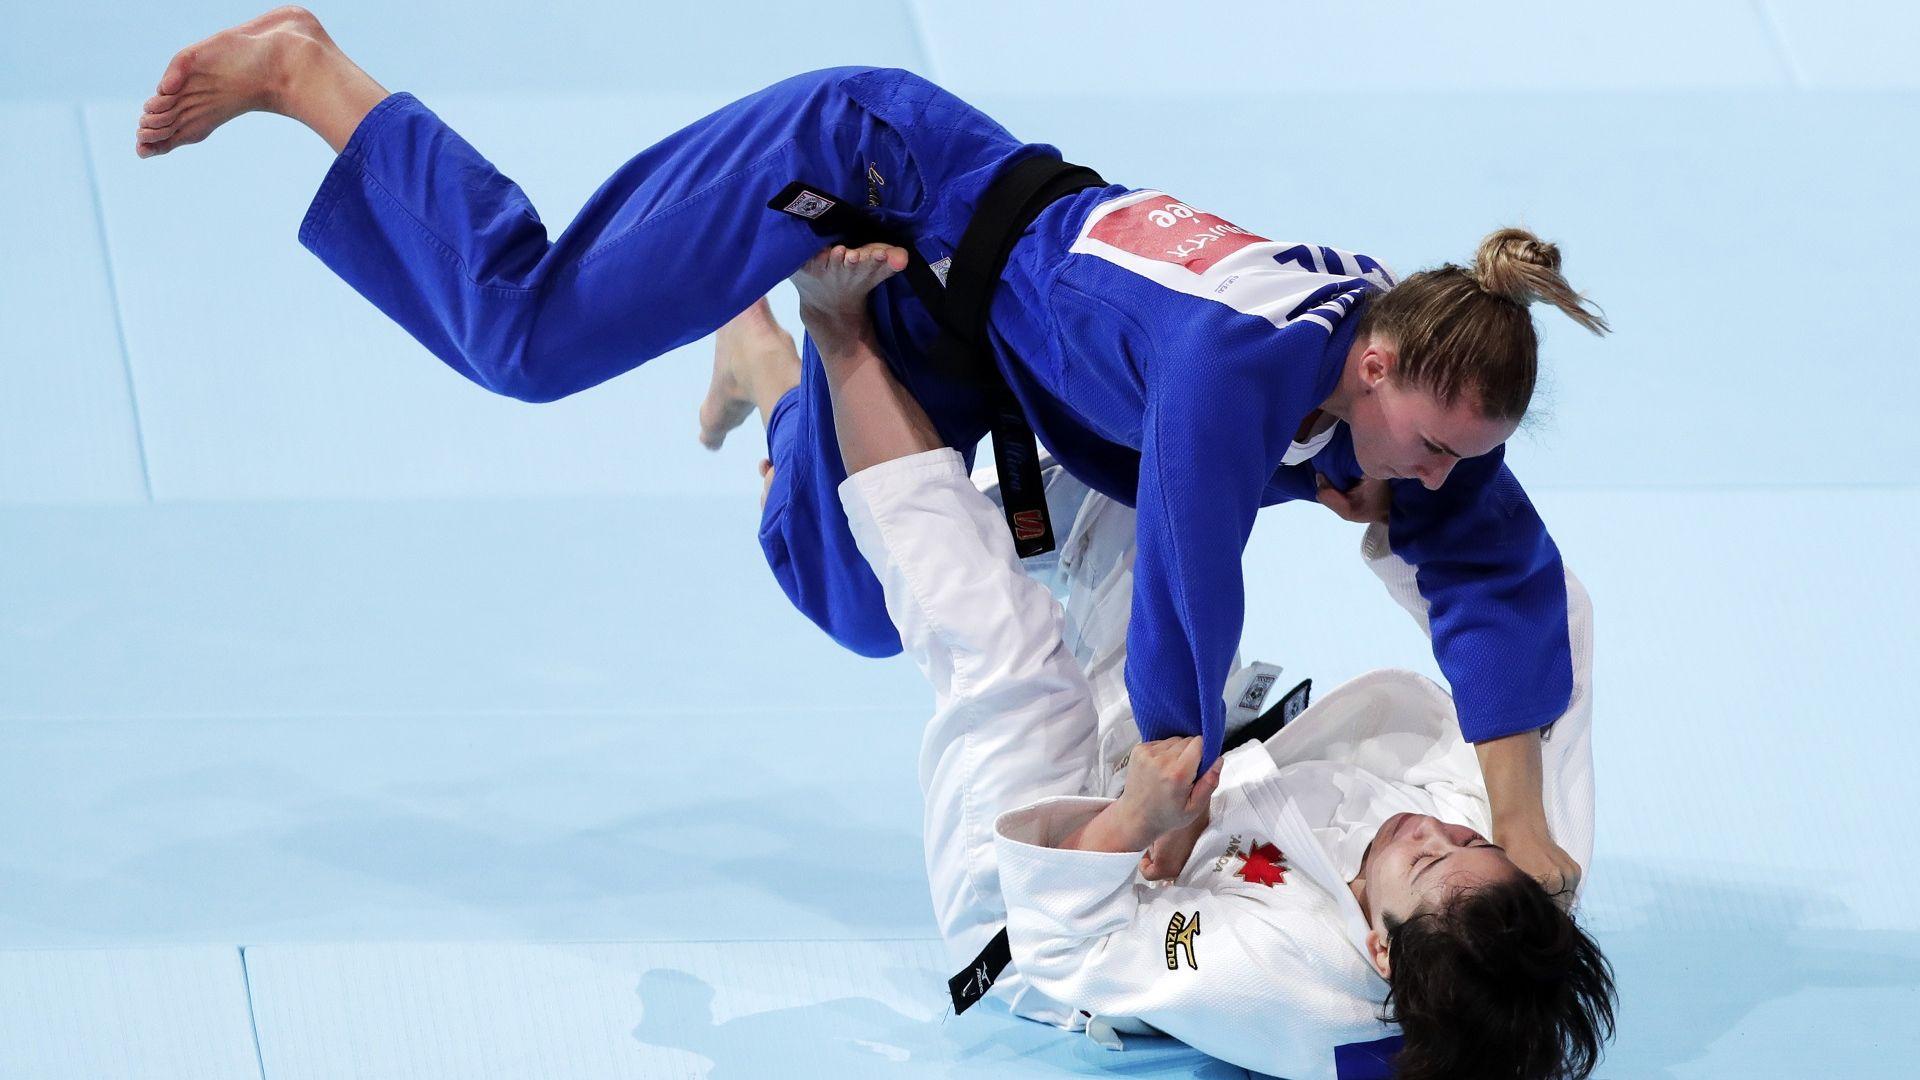 Световната шампионка се оказа непреодолимо препятствие за Ивелина Илиева